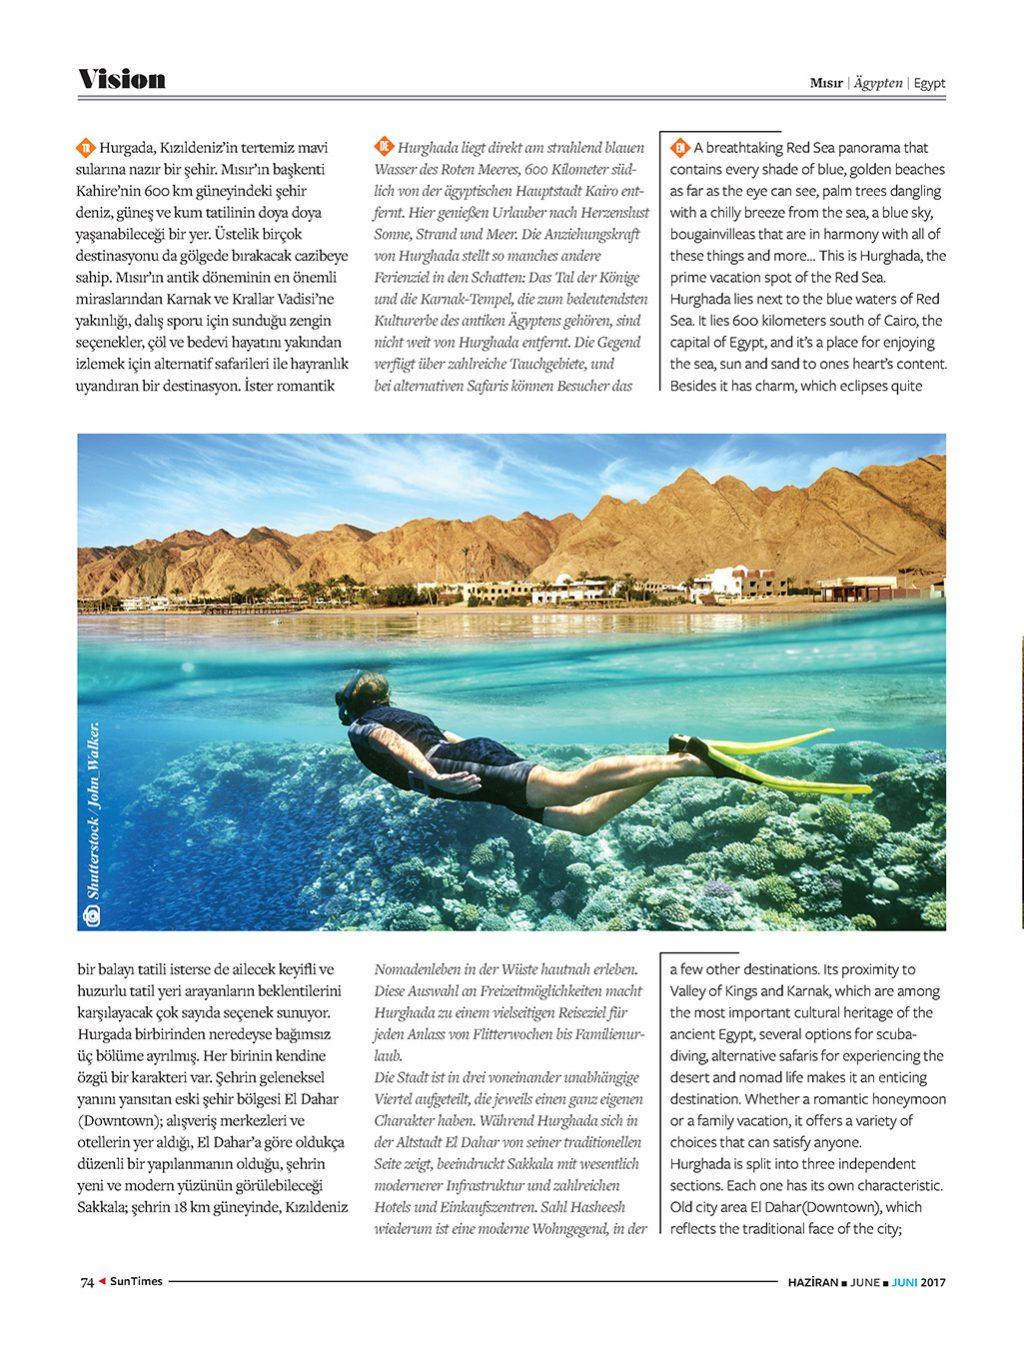 Suntimes Hurghada